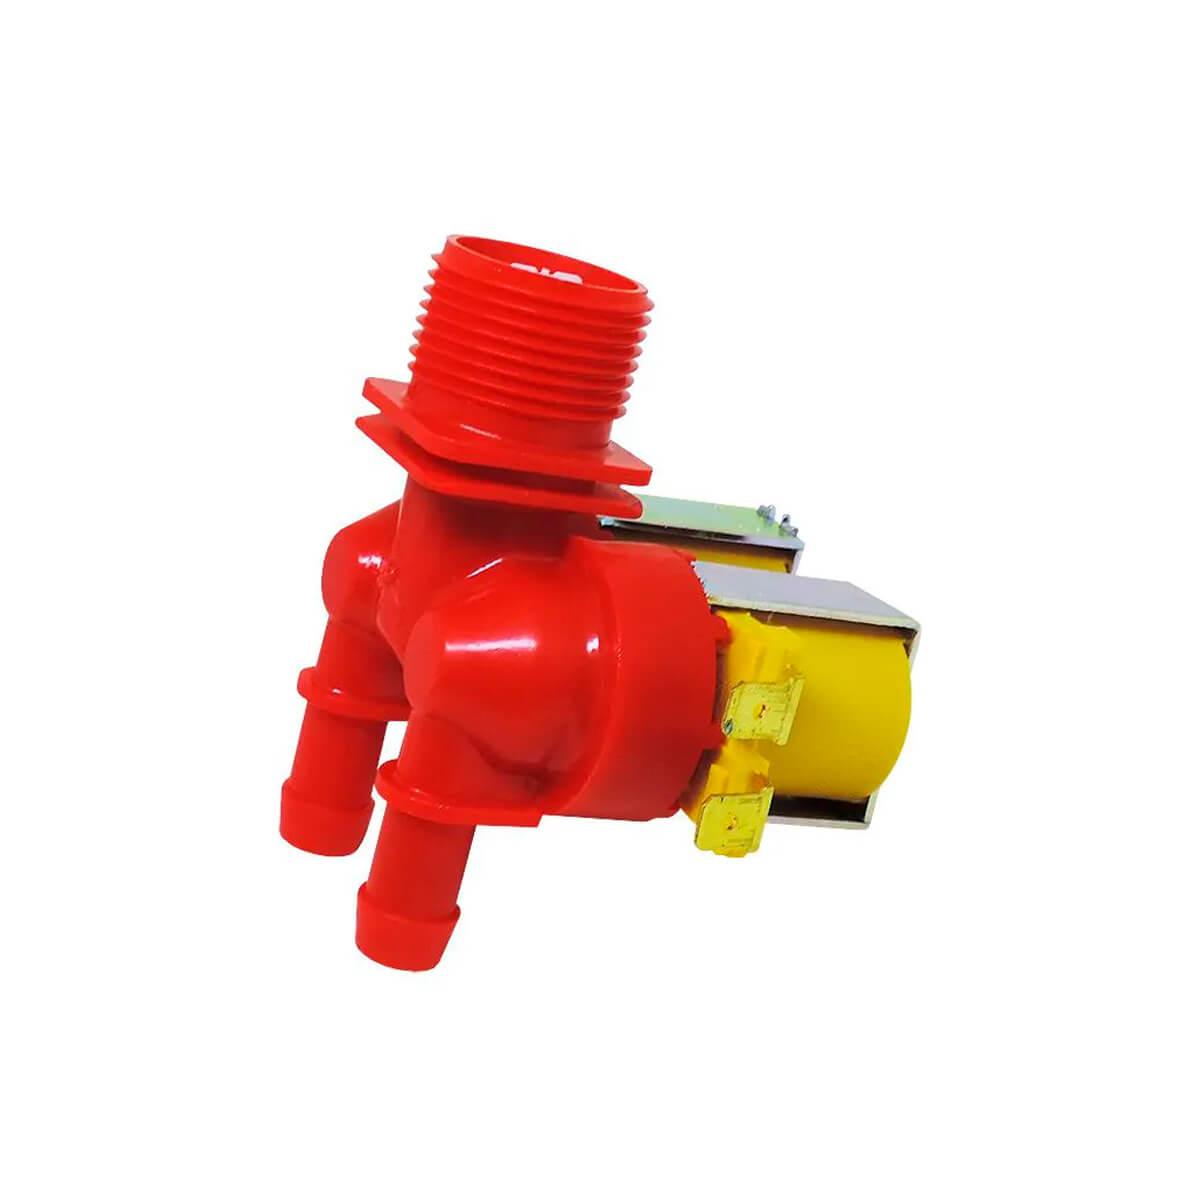 Válvula Dupla 127V Para Lavadora LT13B LTC10 Electrolux - 64287503